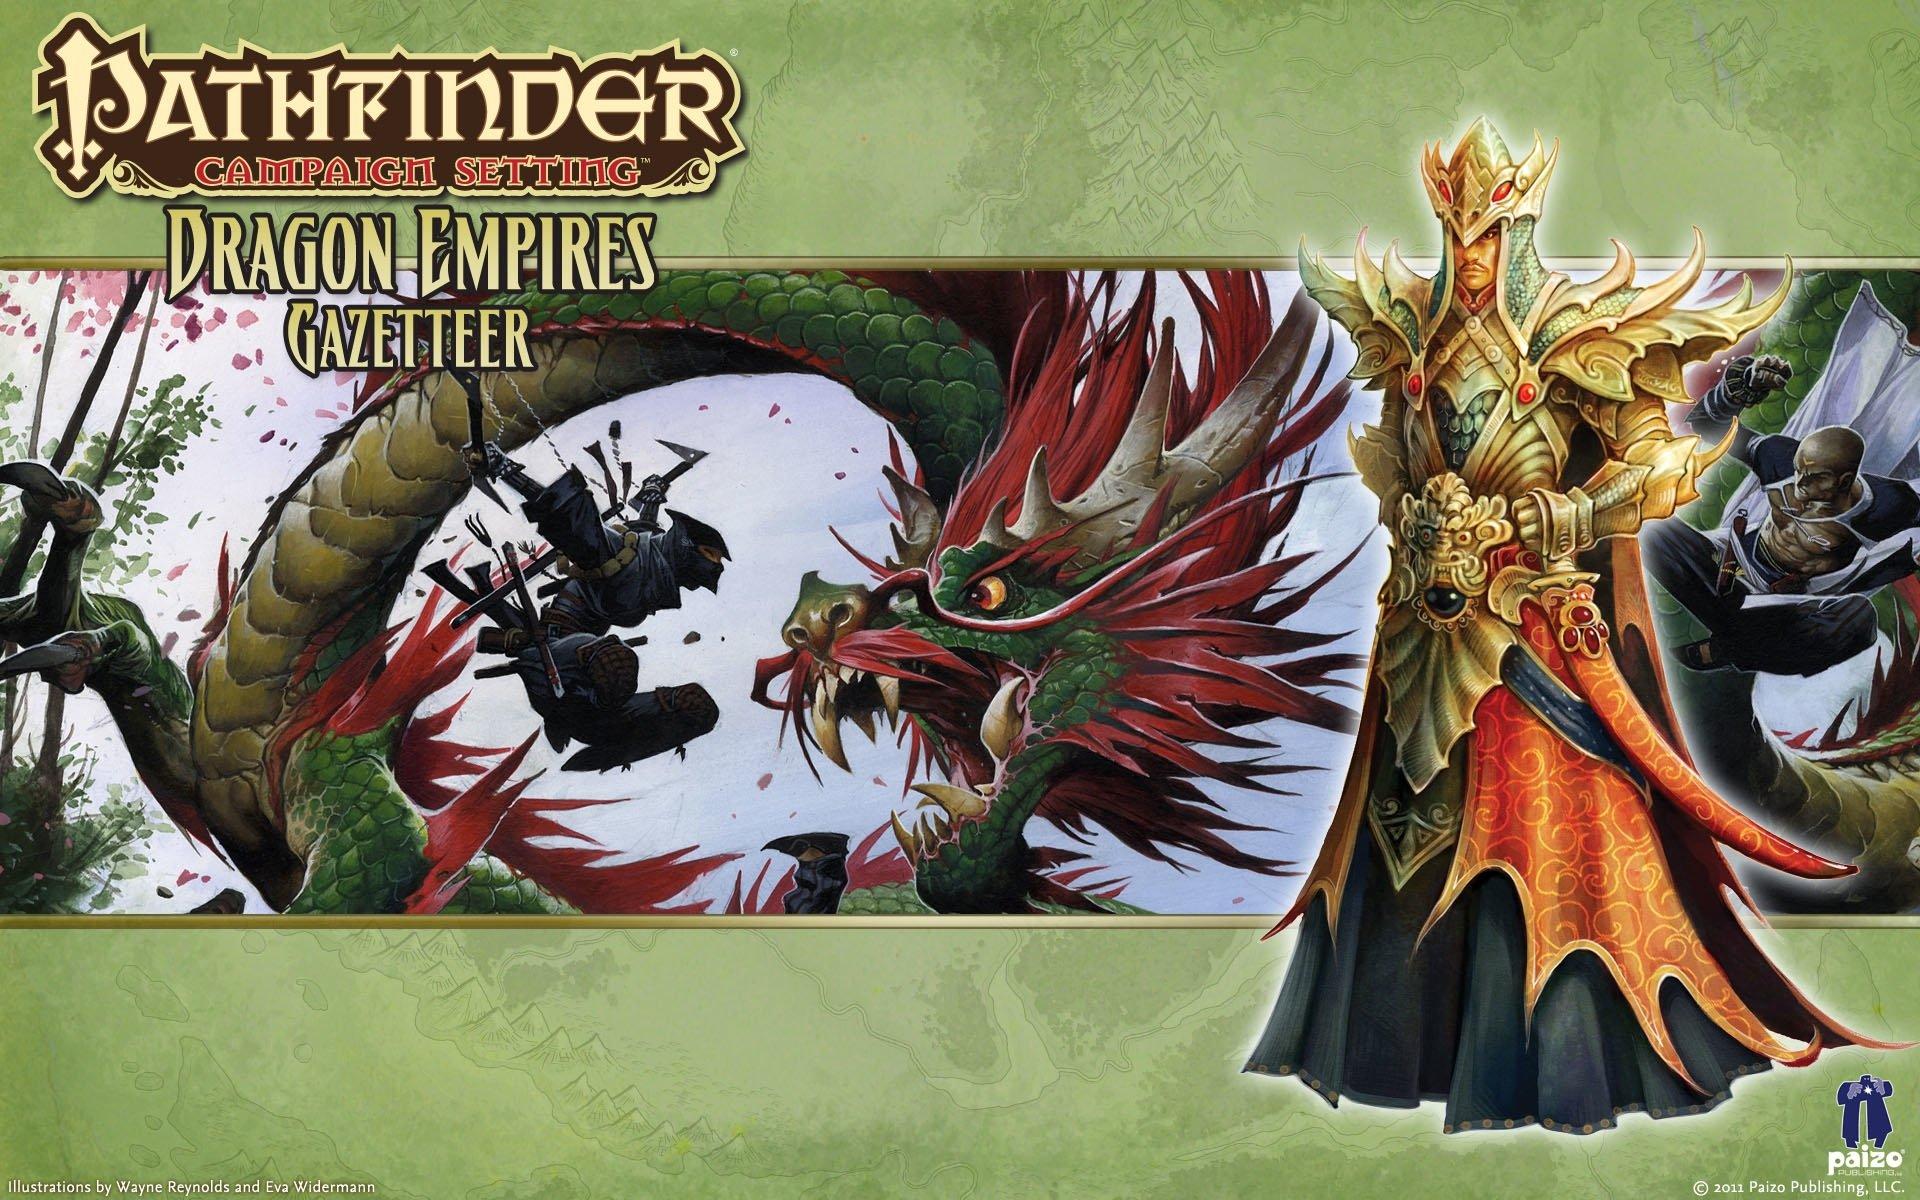 PATHFINDER rpg fantasy dragon board 18 wallpaper 1920x1200